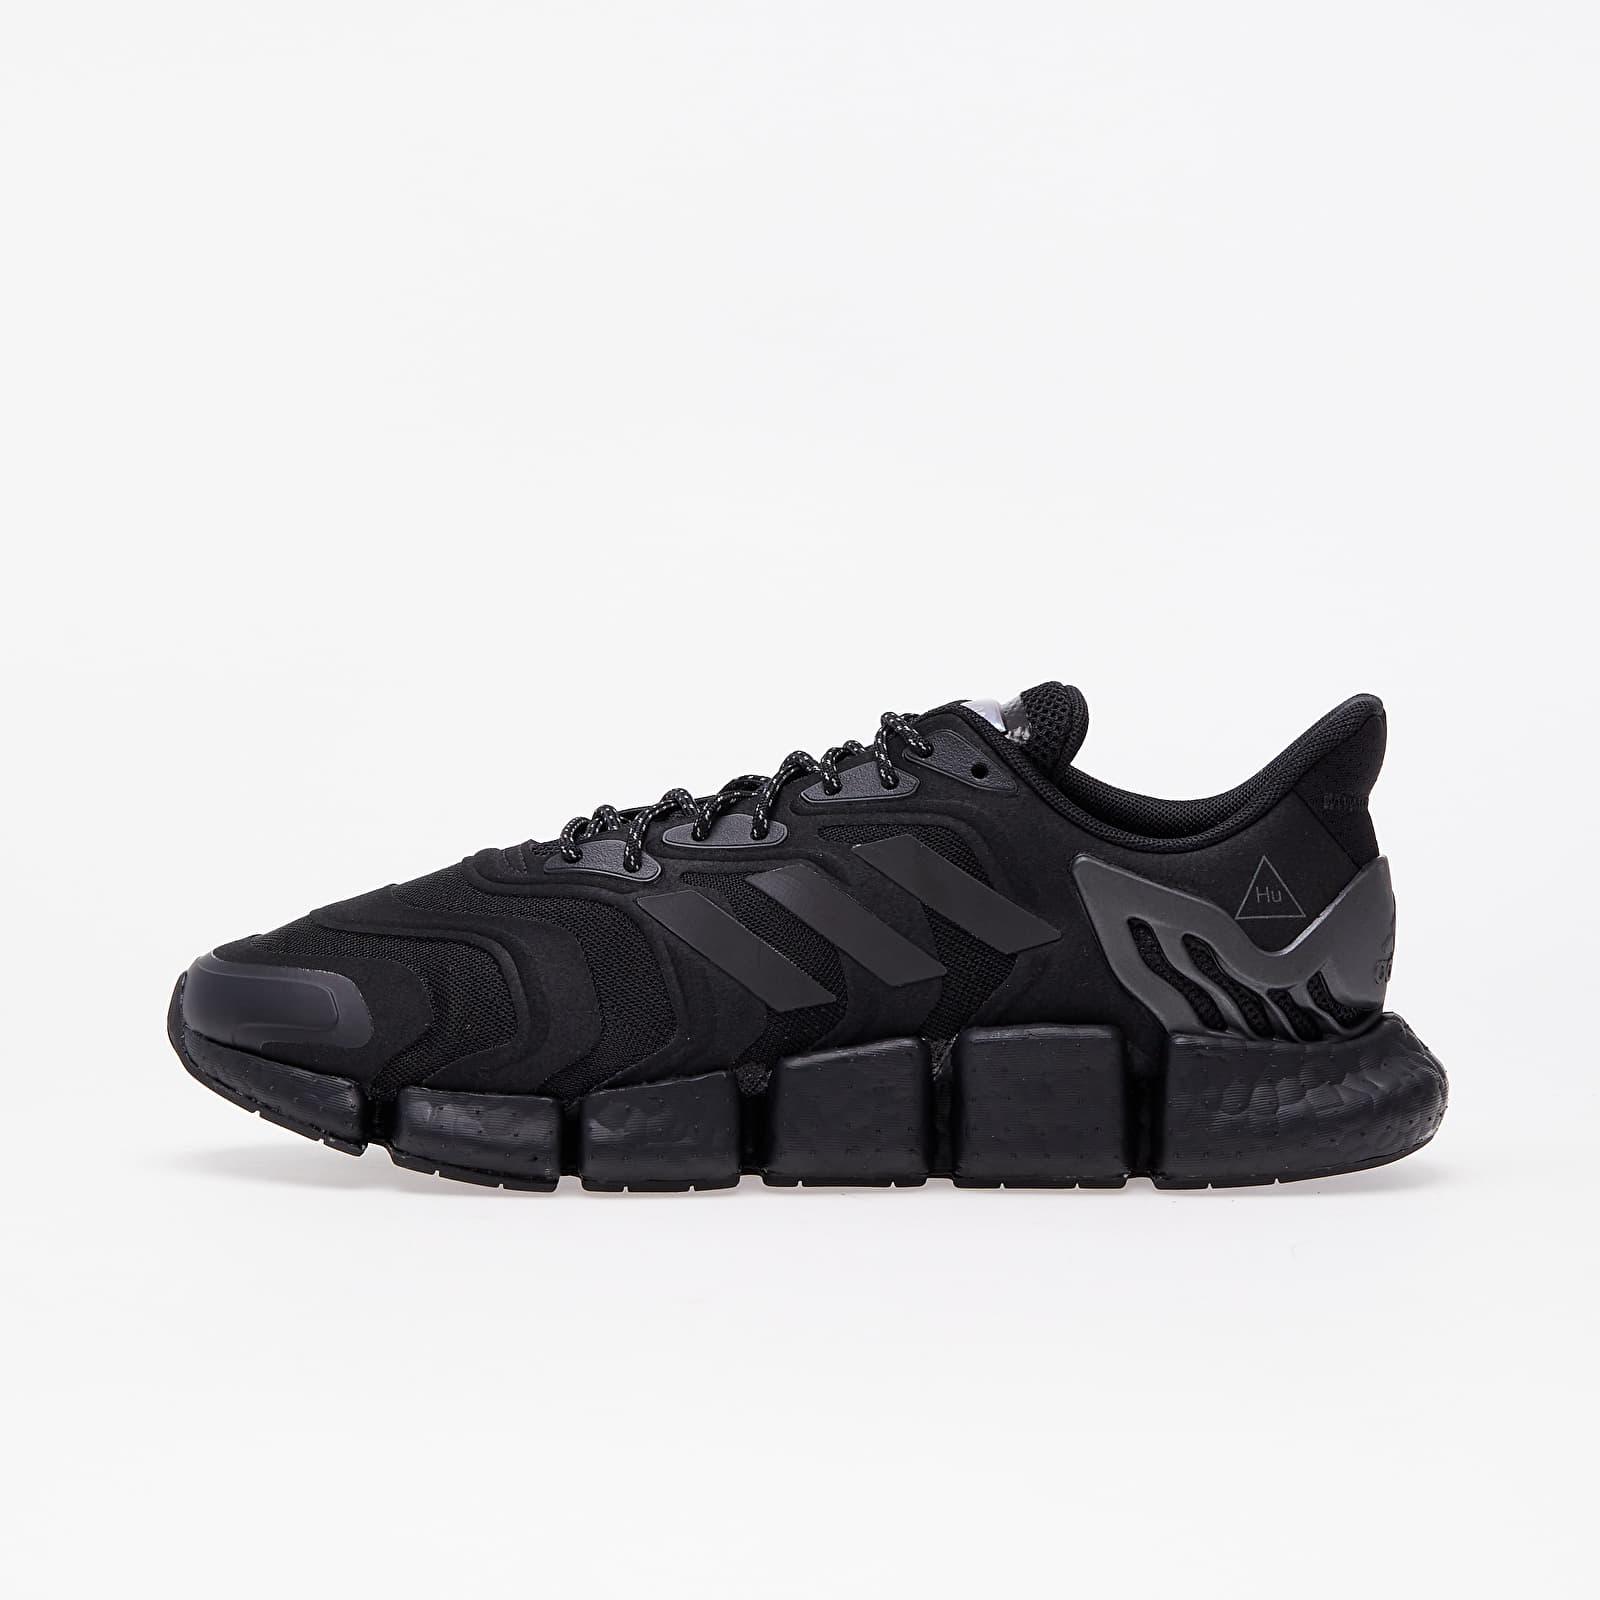 adidas x Pharrell Williams Climacool Vento HU Core Black/ Core Black/ Core Black GZ7593